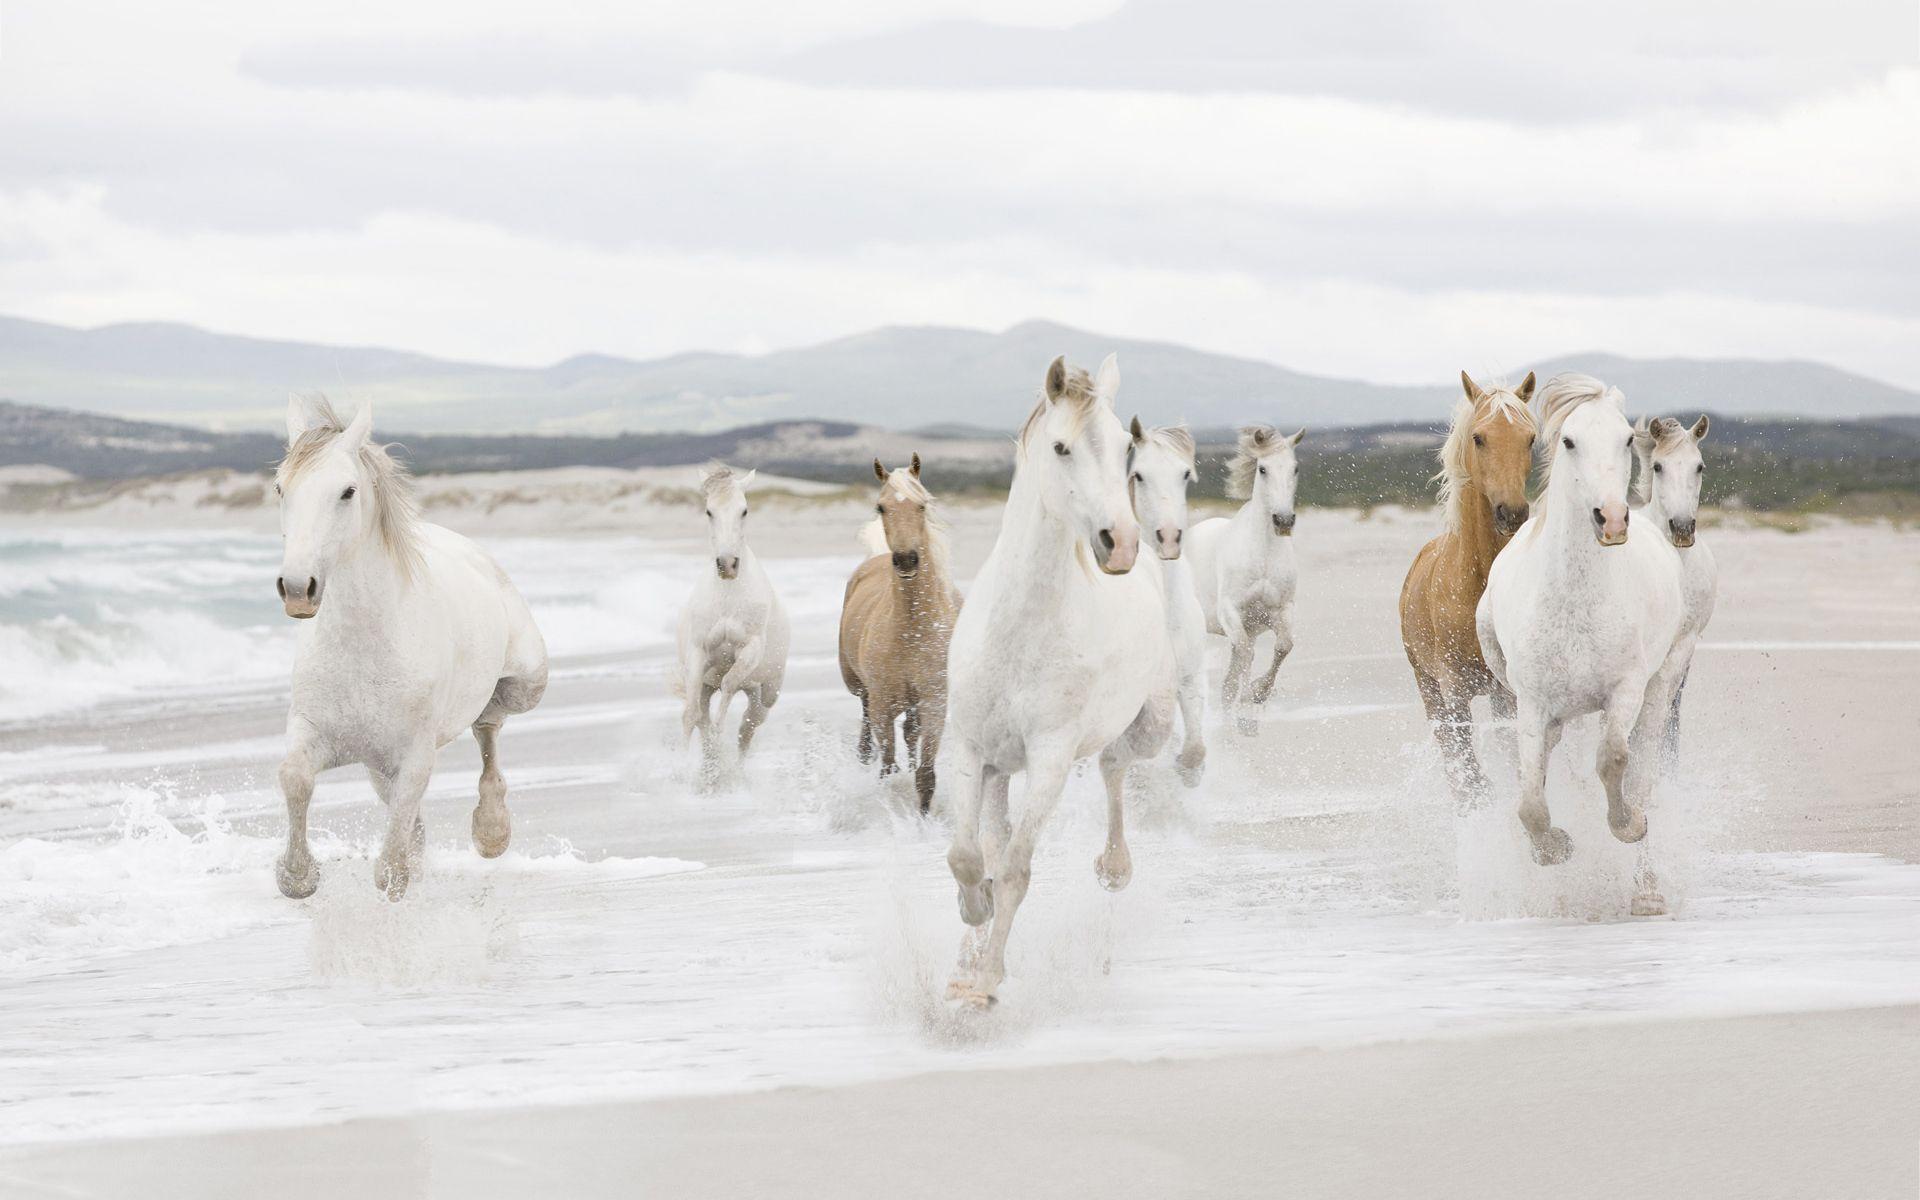 Great Wallpaper Horse Beach - b36245abcda36148a5febe92494a3ac4  Pictures_135785.jpg